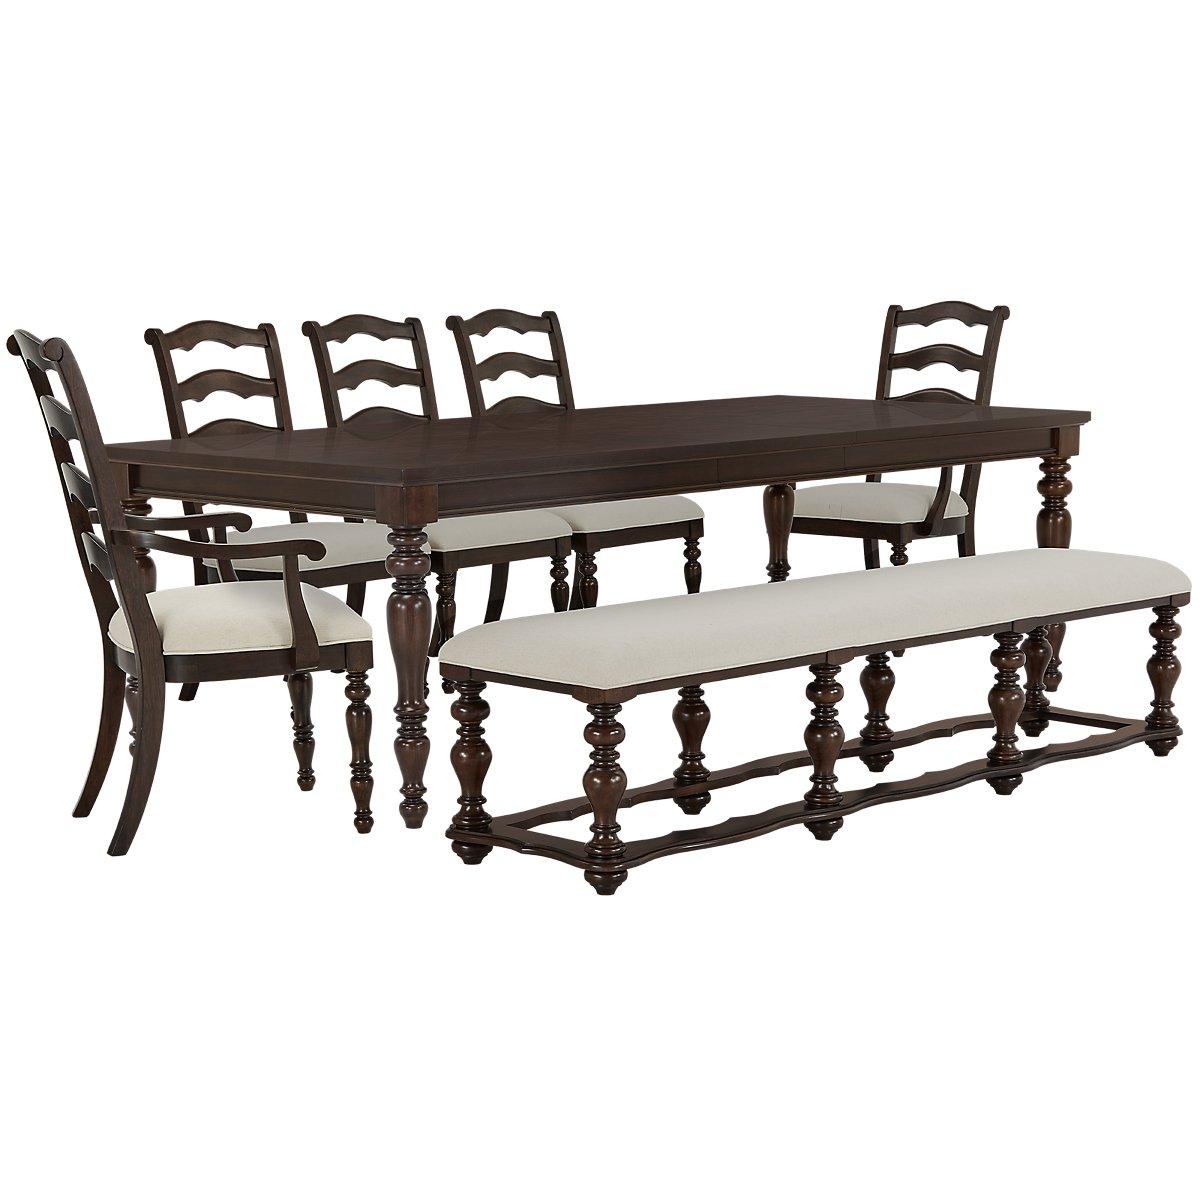 Savannah Dark Tone Wood Table, 4 Chairs & Bench